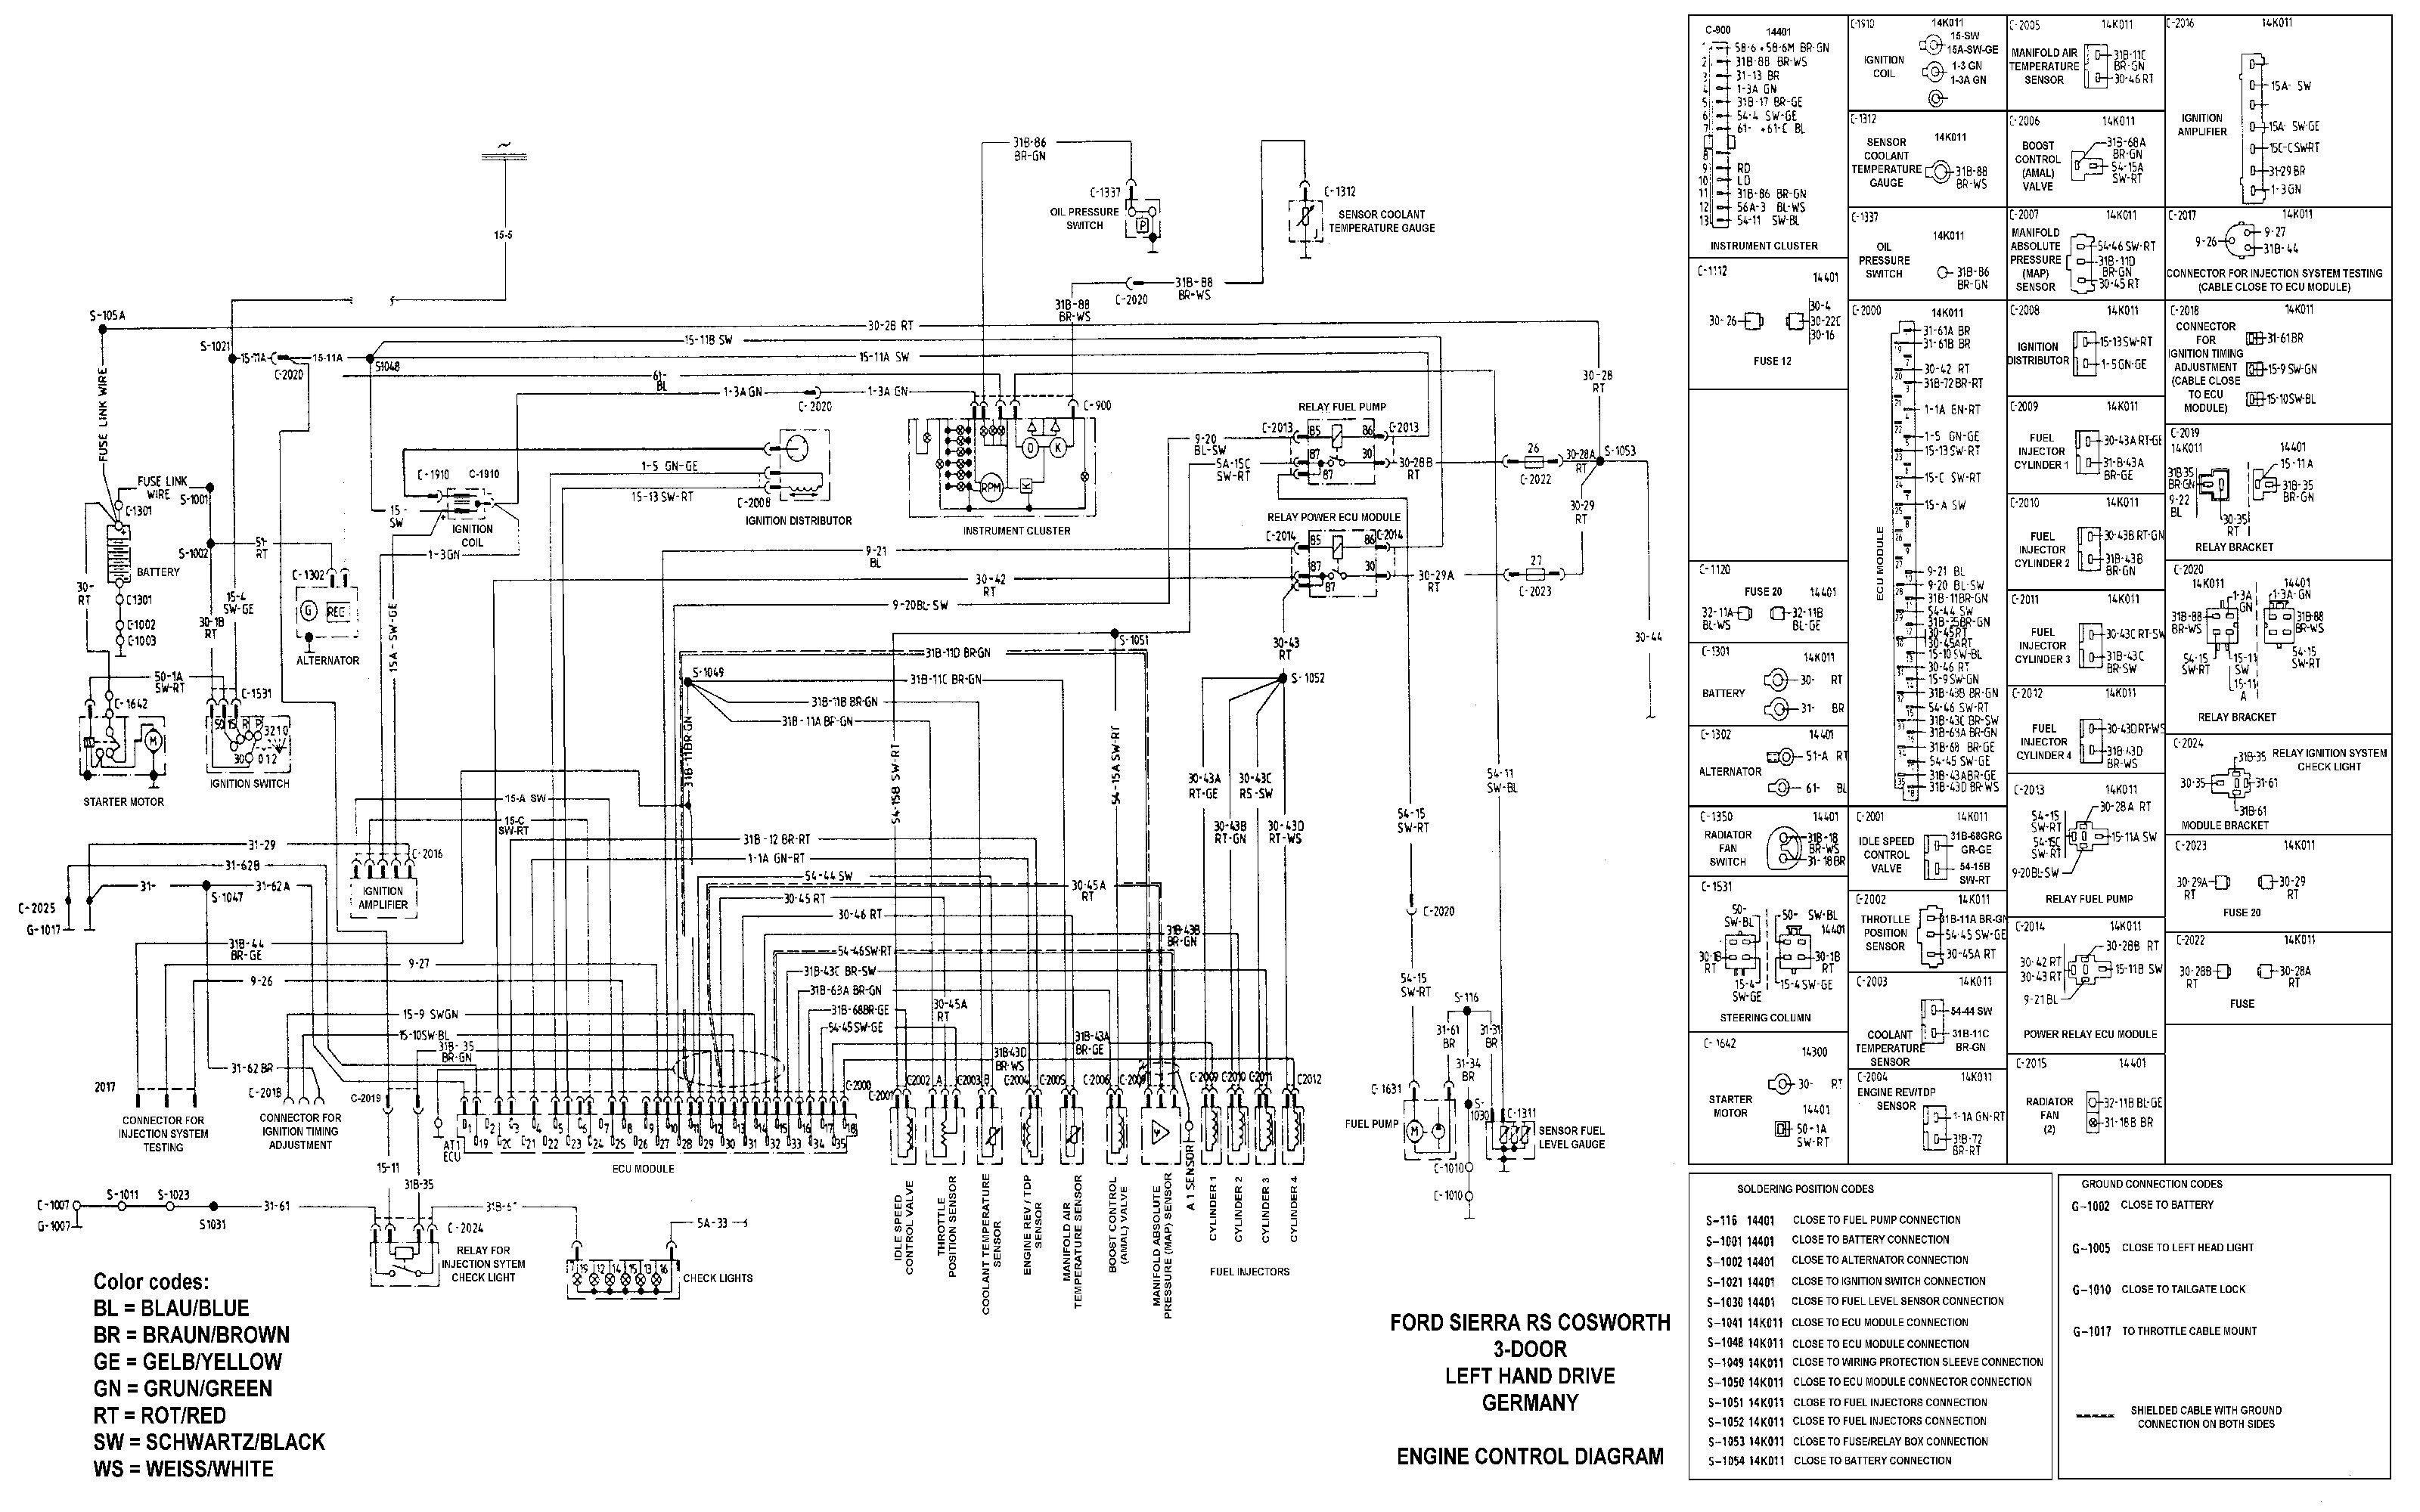 Ford Alternator Wiring Diagrams In 2021 Wiring Diagram Diagram Ford Focus